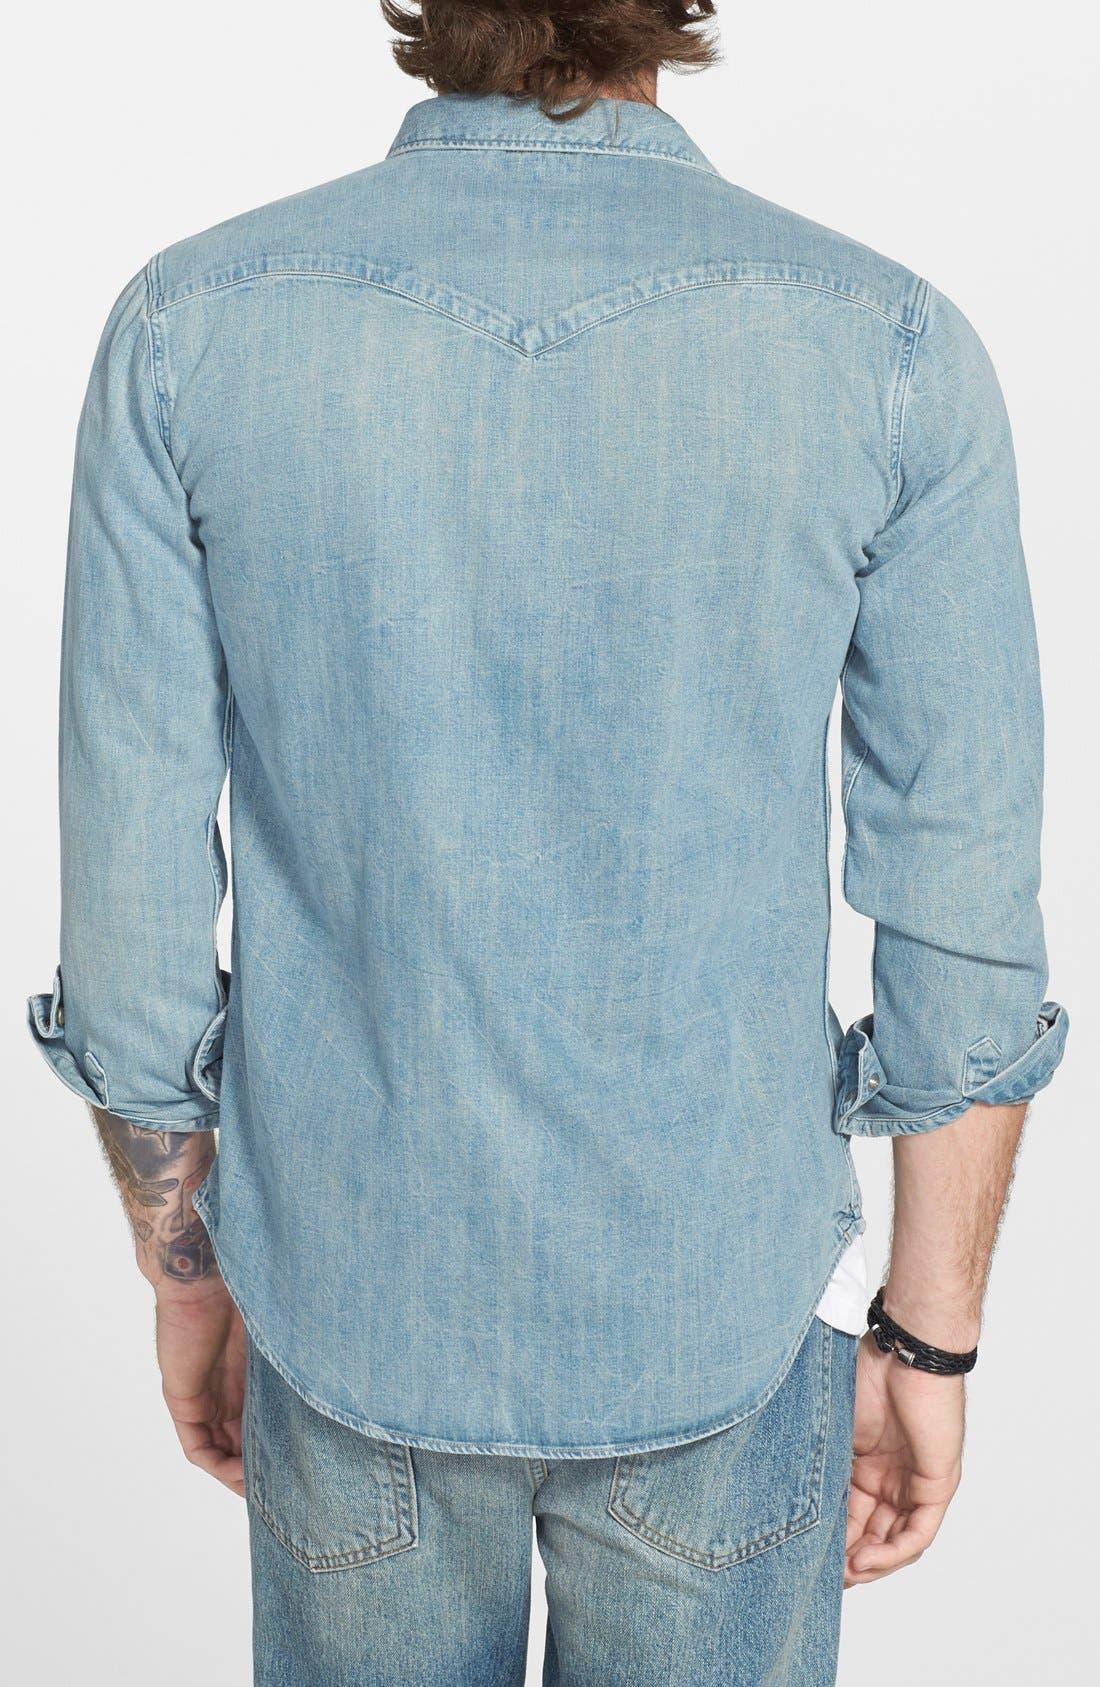 'Barstow' Denim Western Shirt,                             Alternate thumbnail 18, color,